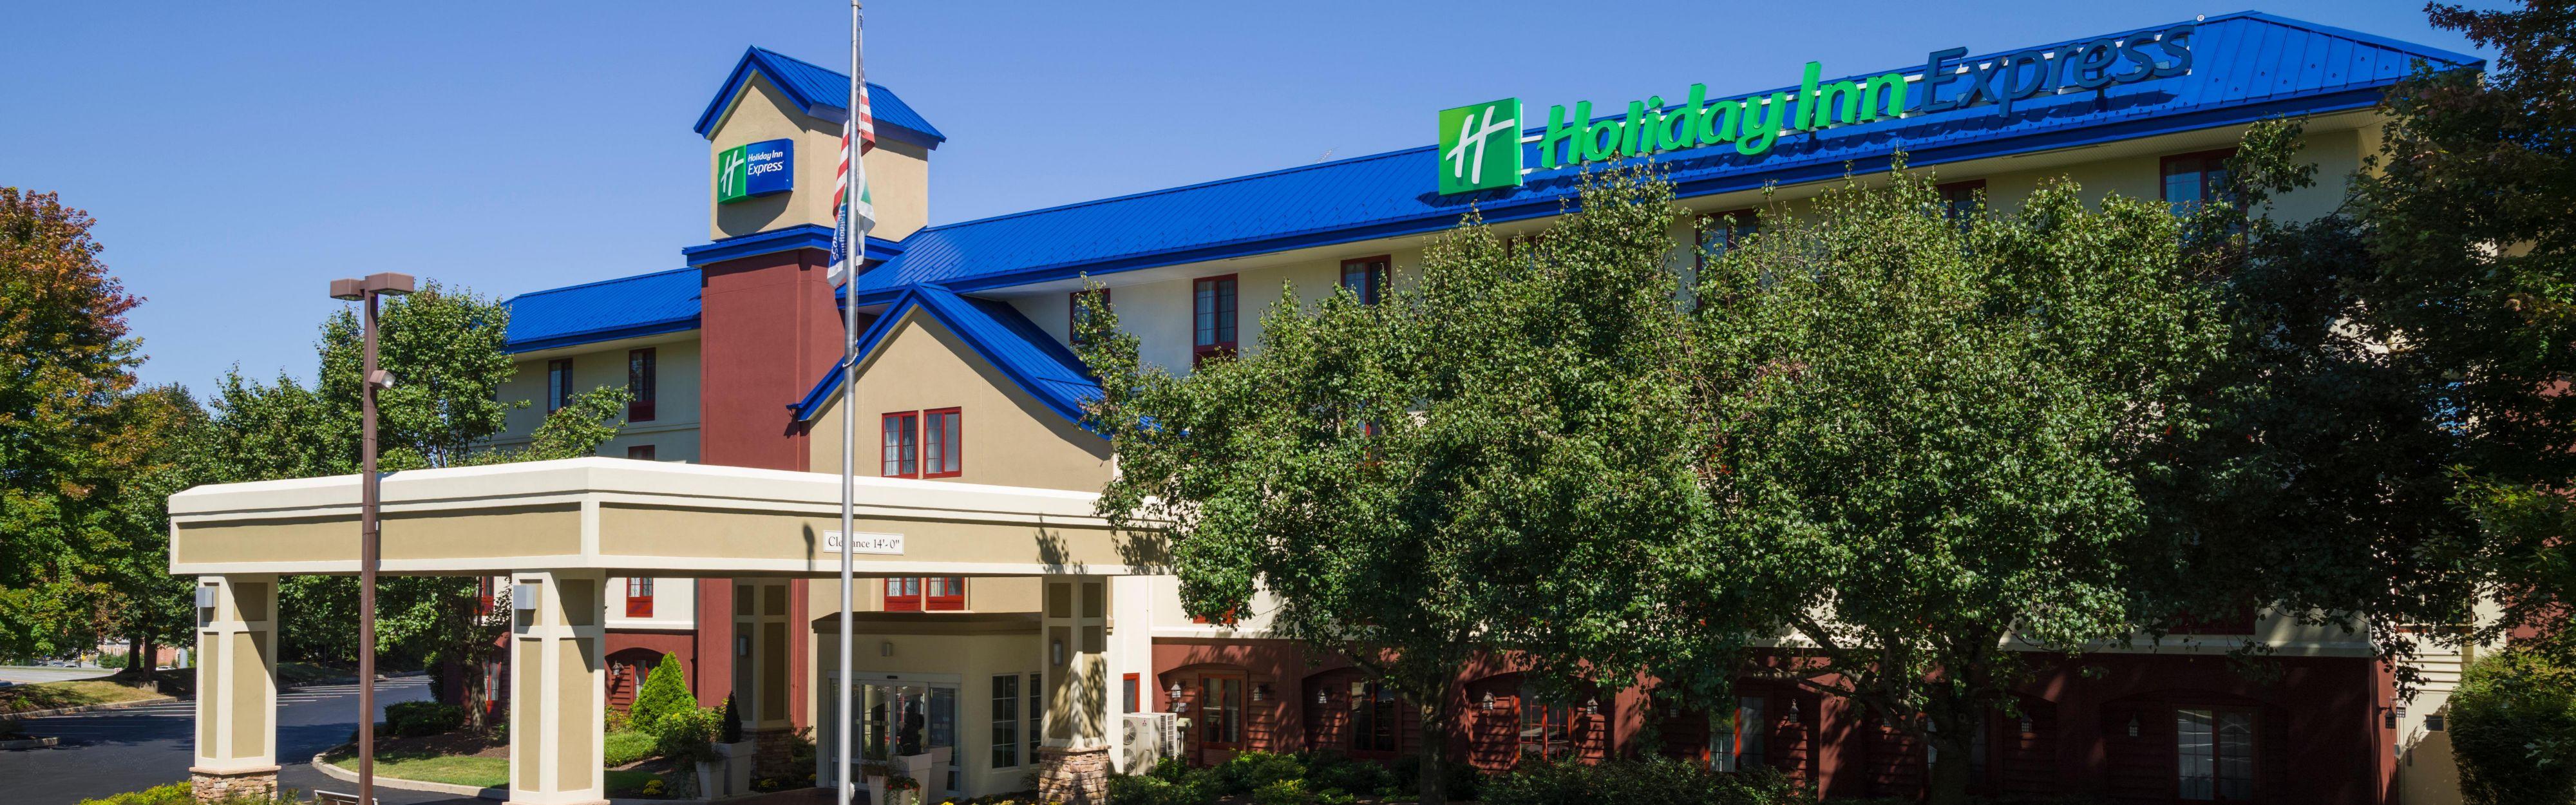 Holiday Inn Express Frazer-Malvern image 0